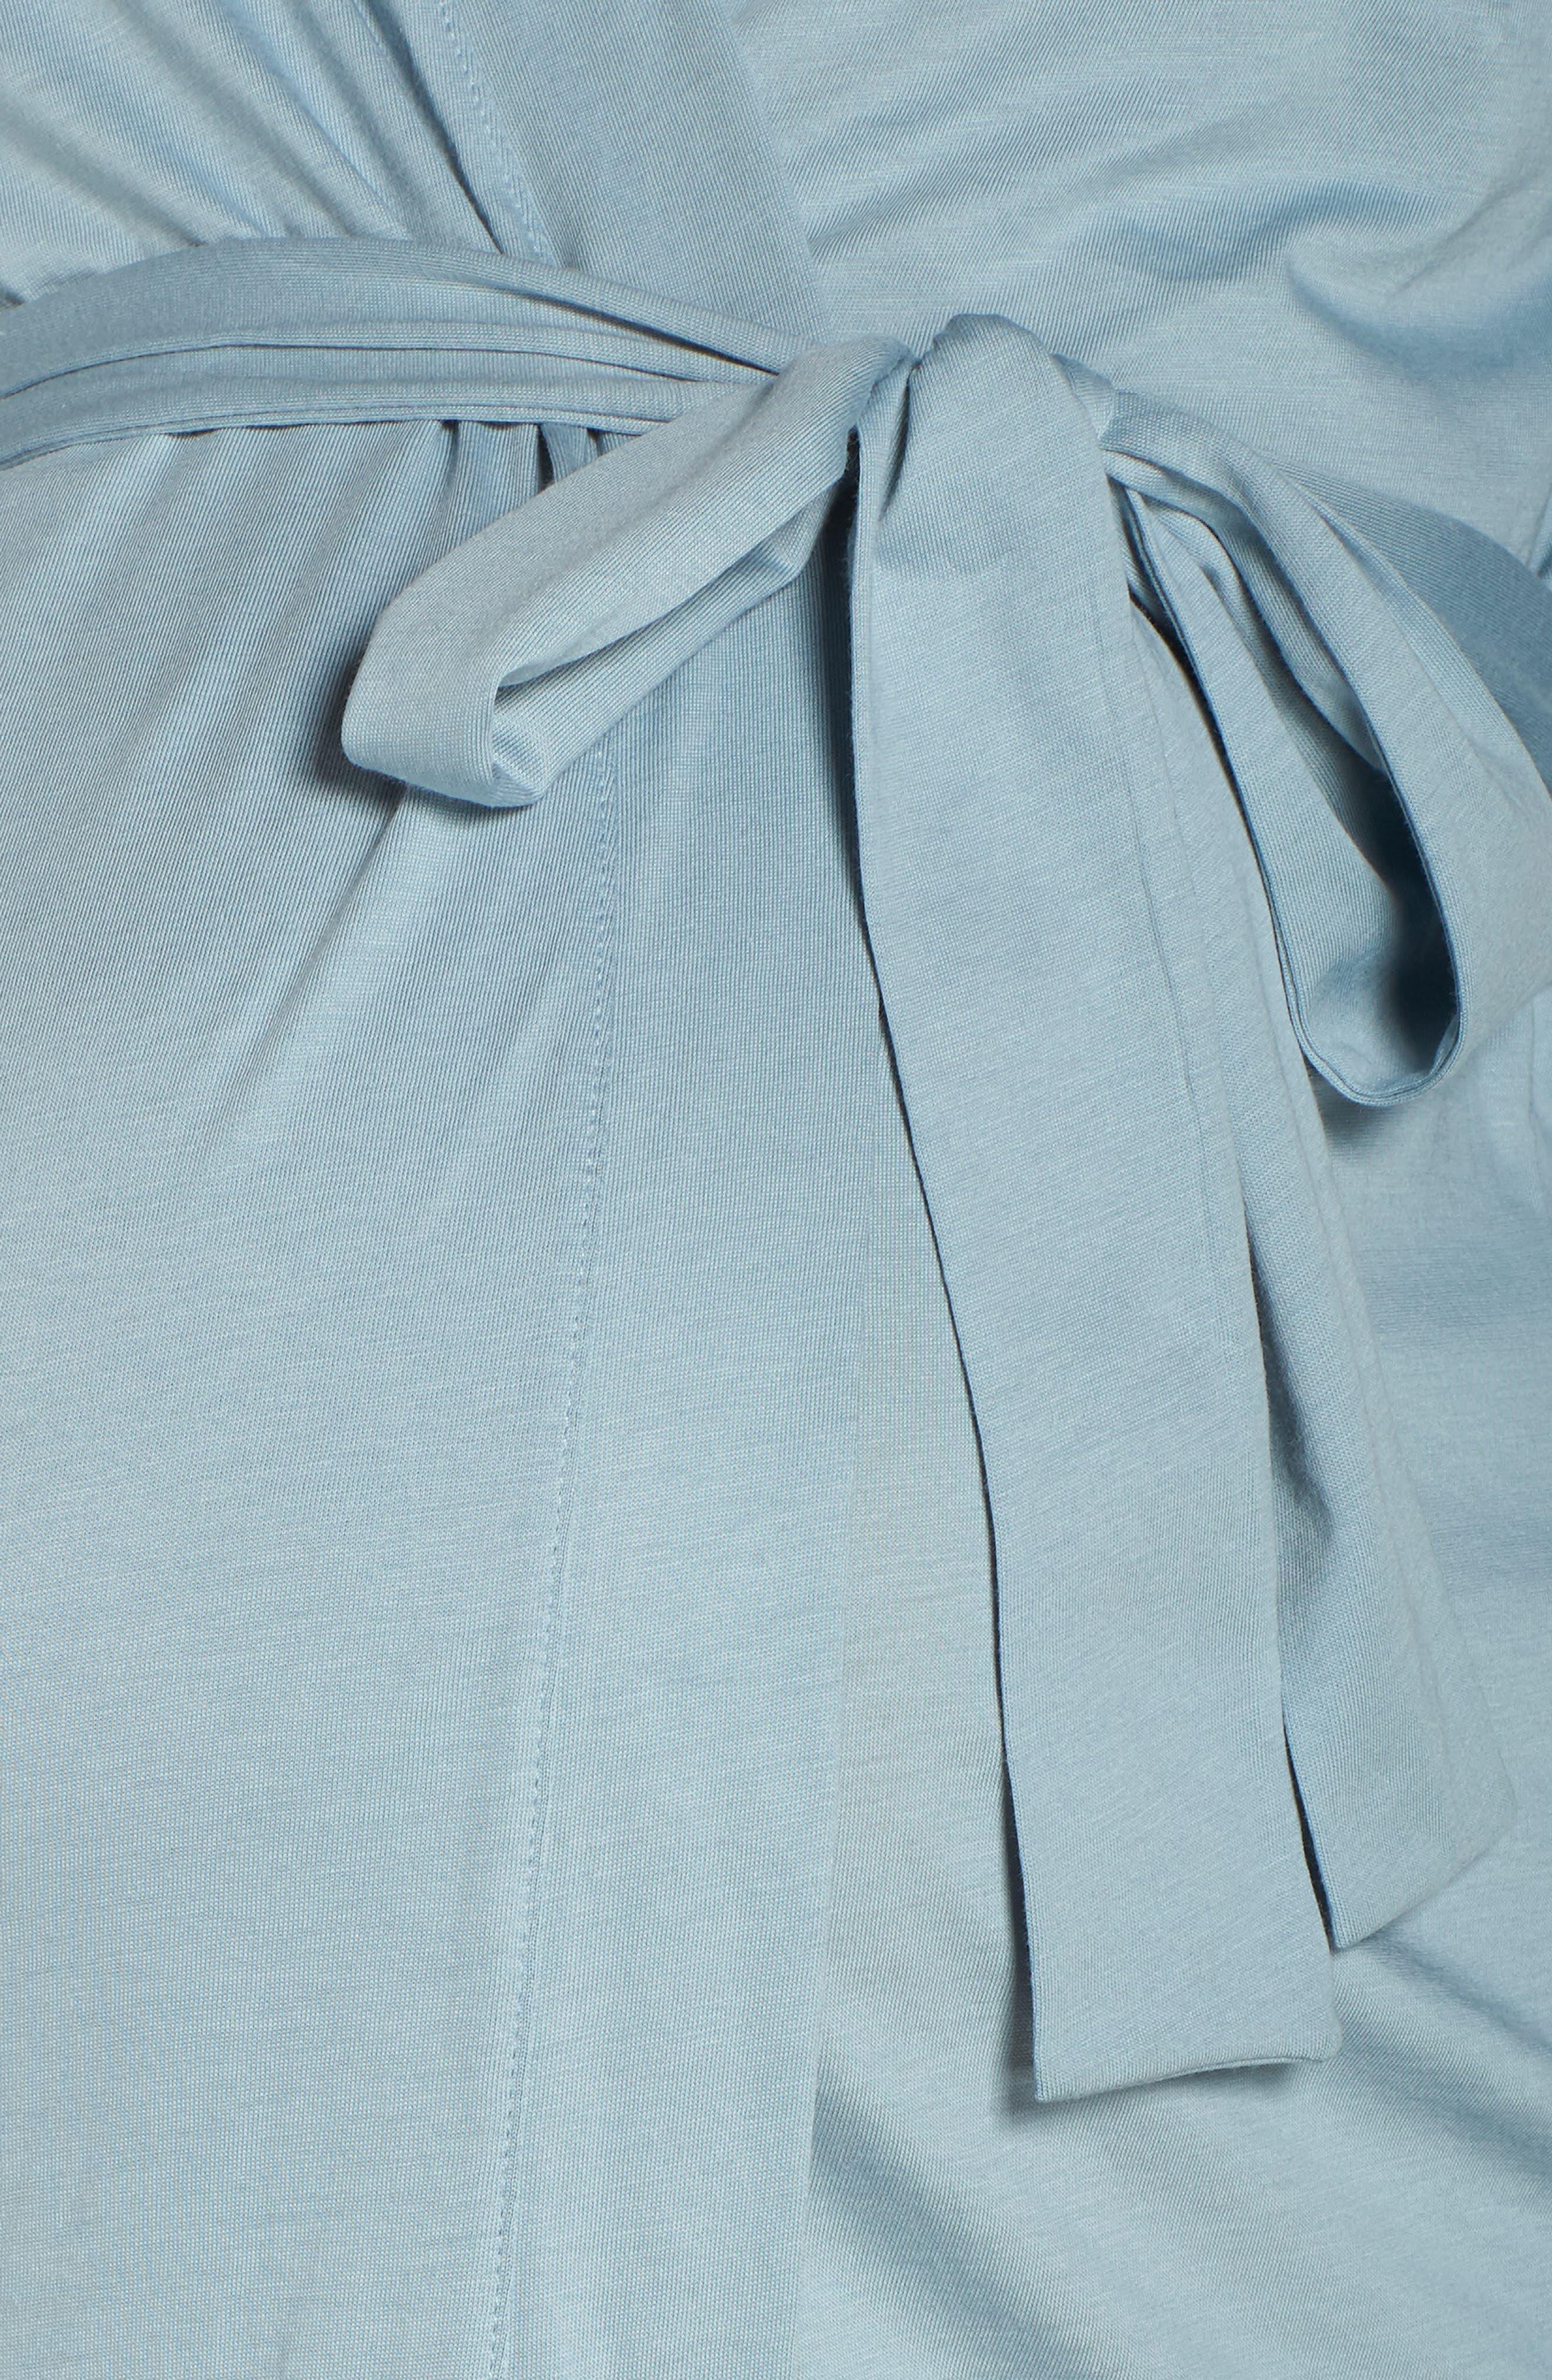 Maternity/Nursing Robe,                             Alternate thumbnail 5, color,                             ROBINS EGG BLUE